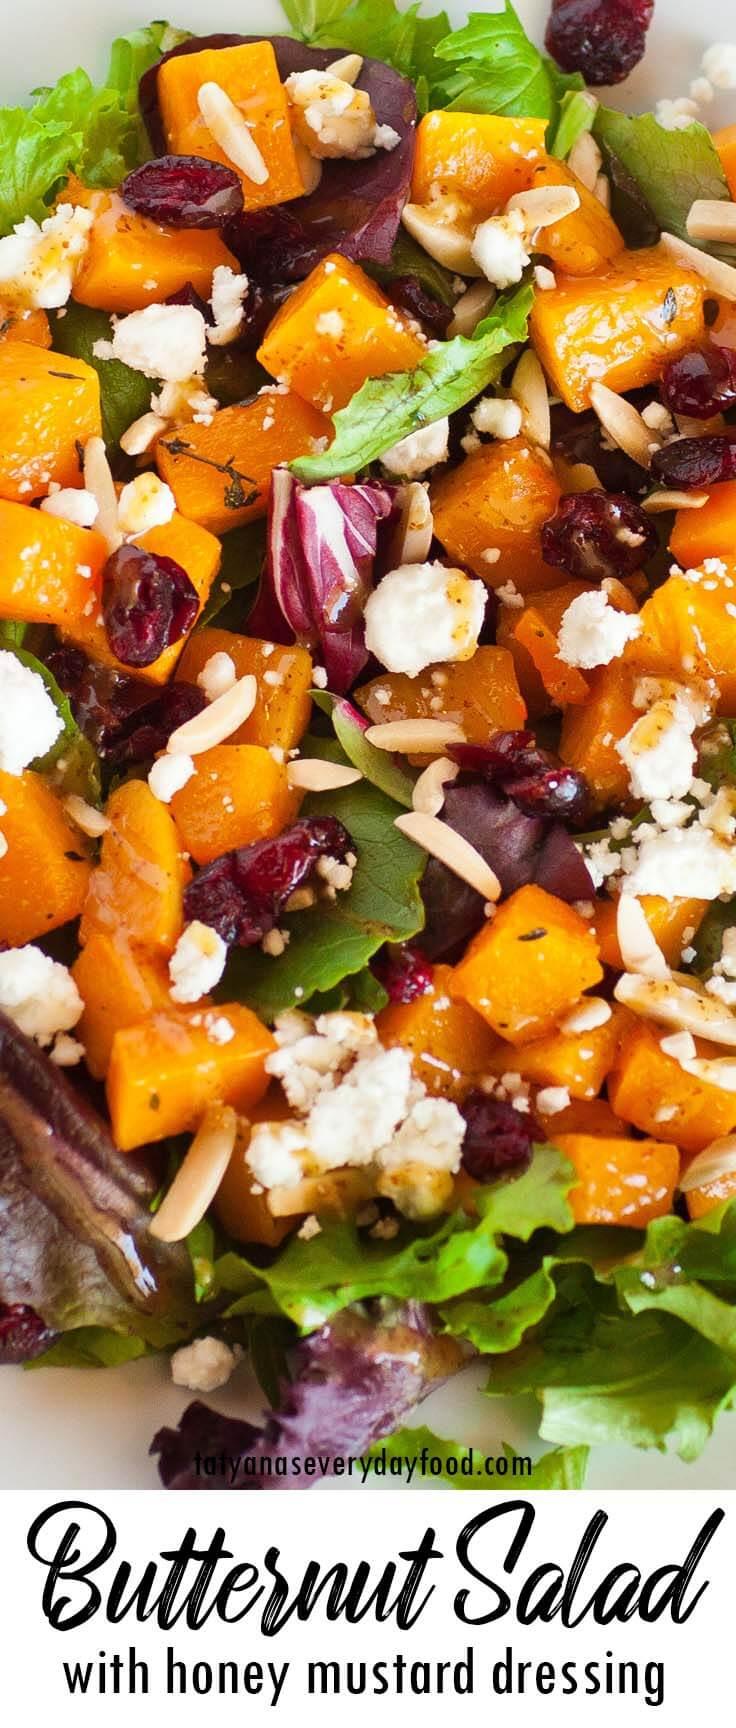 Oven-Roasted Butternut Squash Salad video recipe